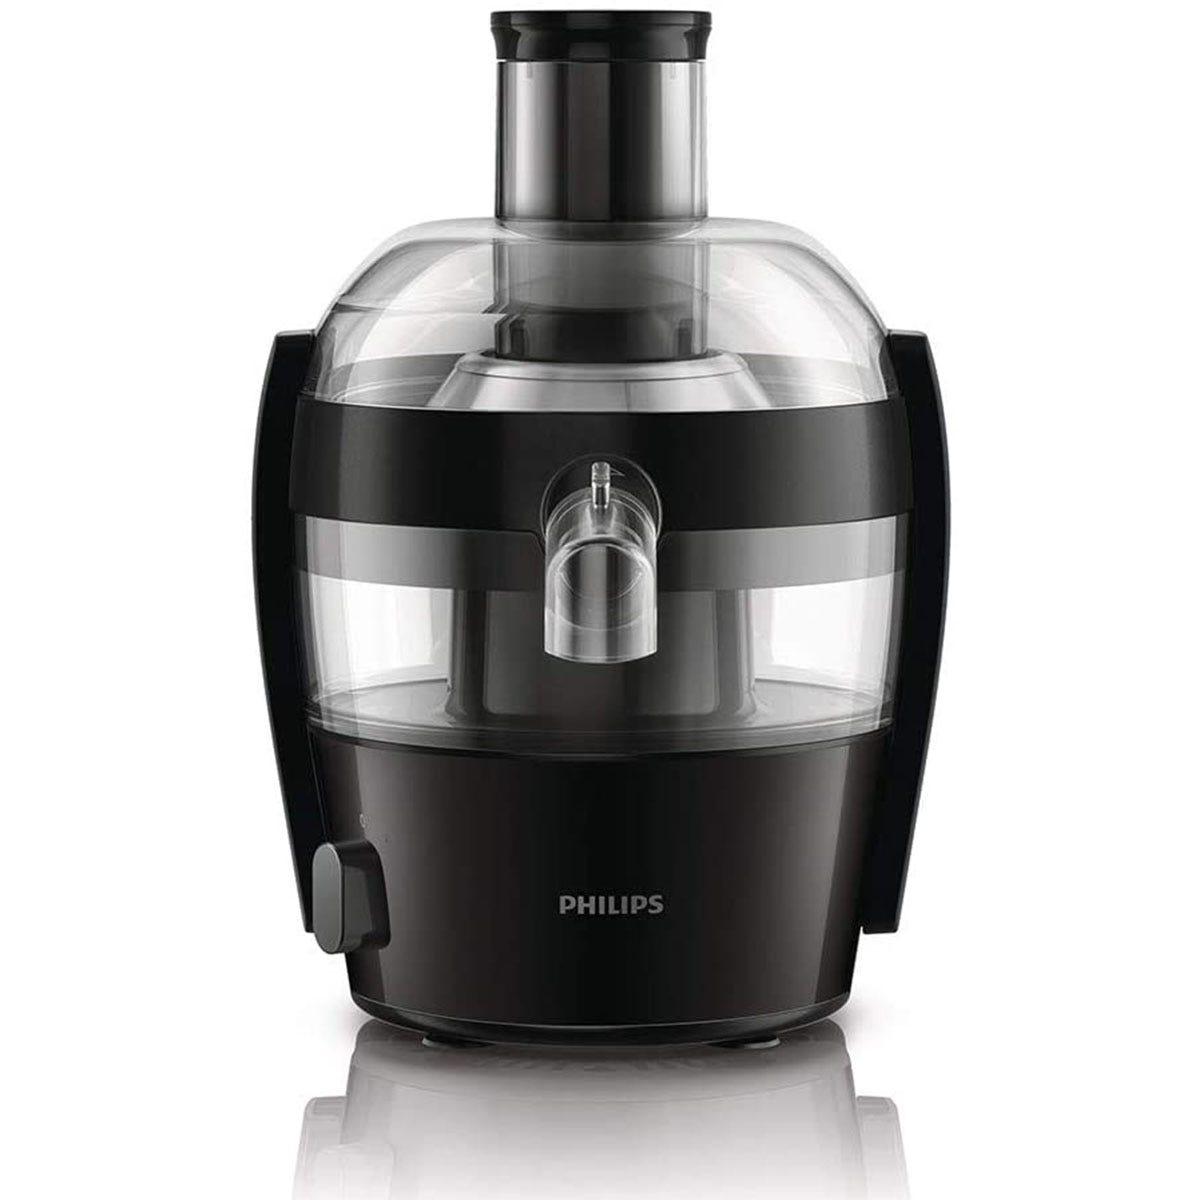 Philips HR1832/01 Viva Juicer - Black